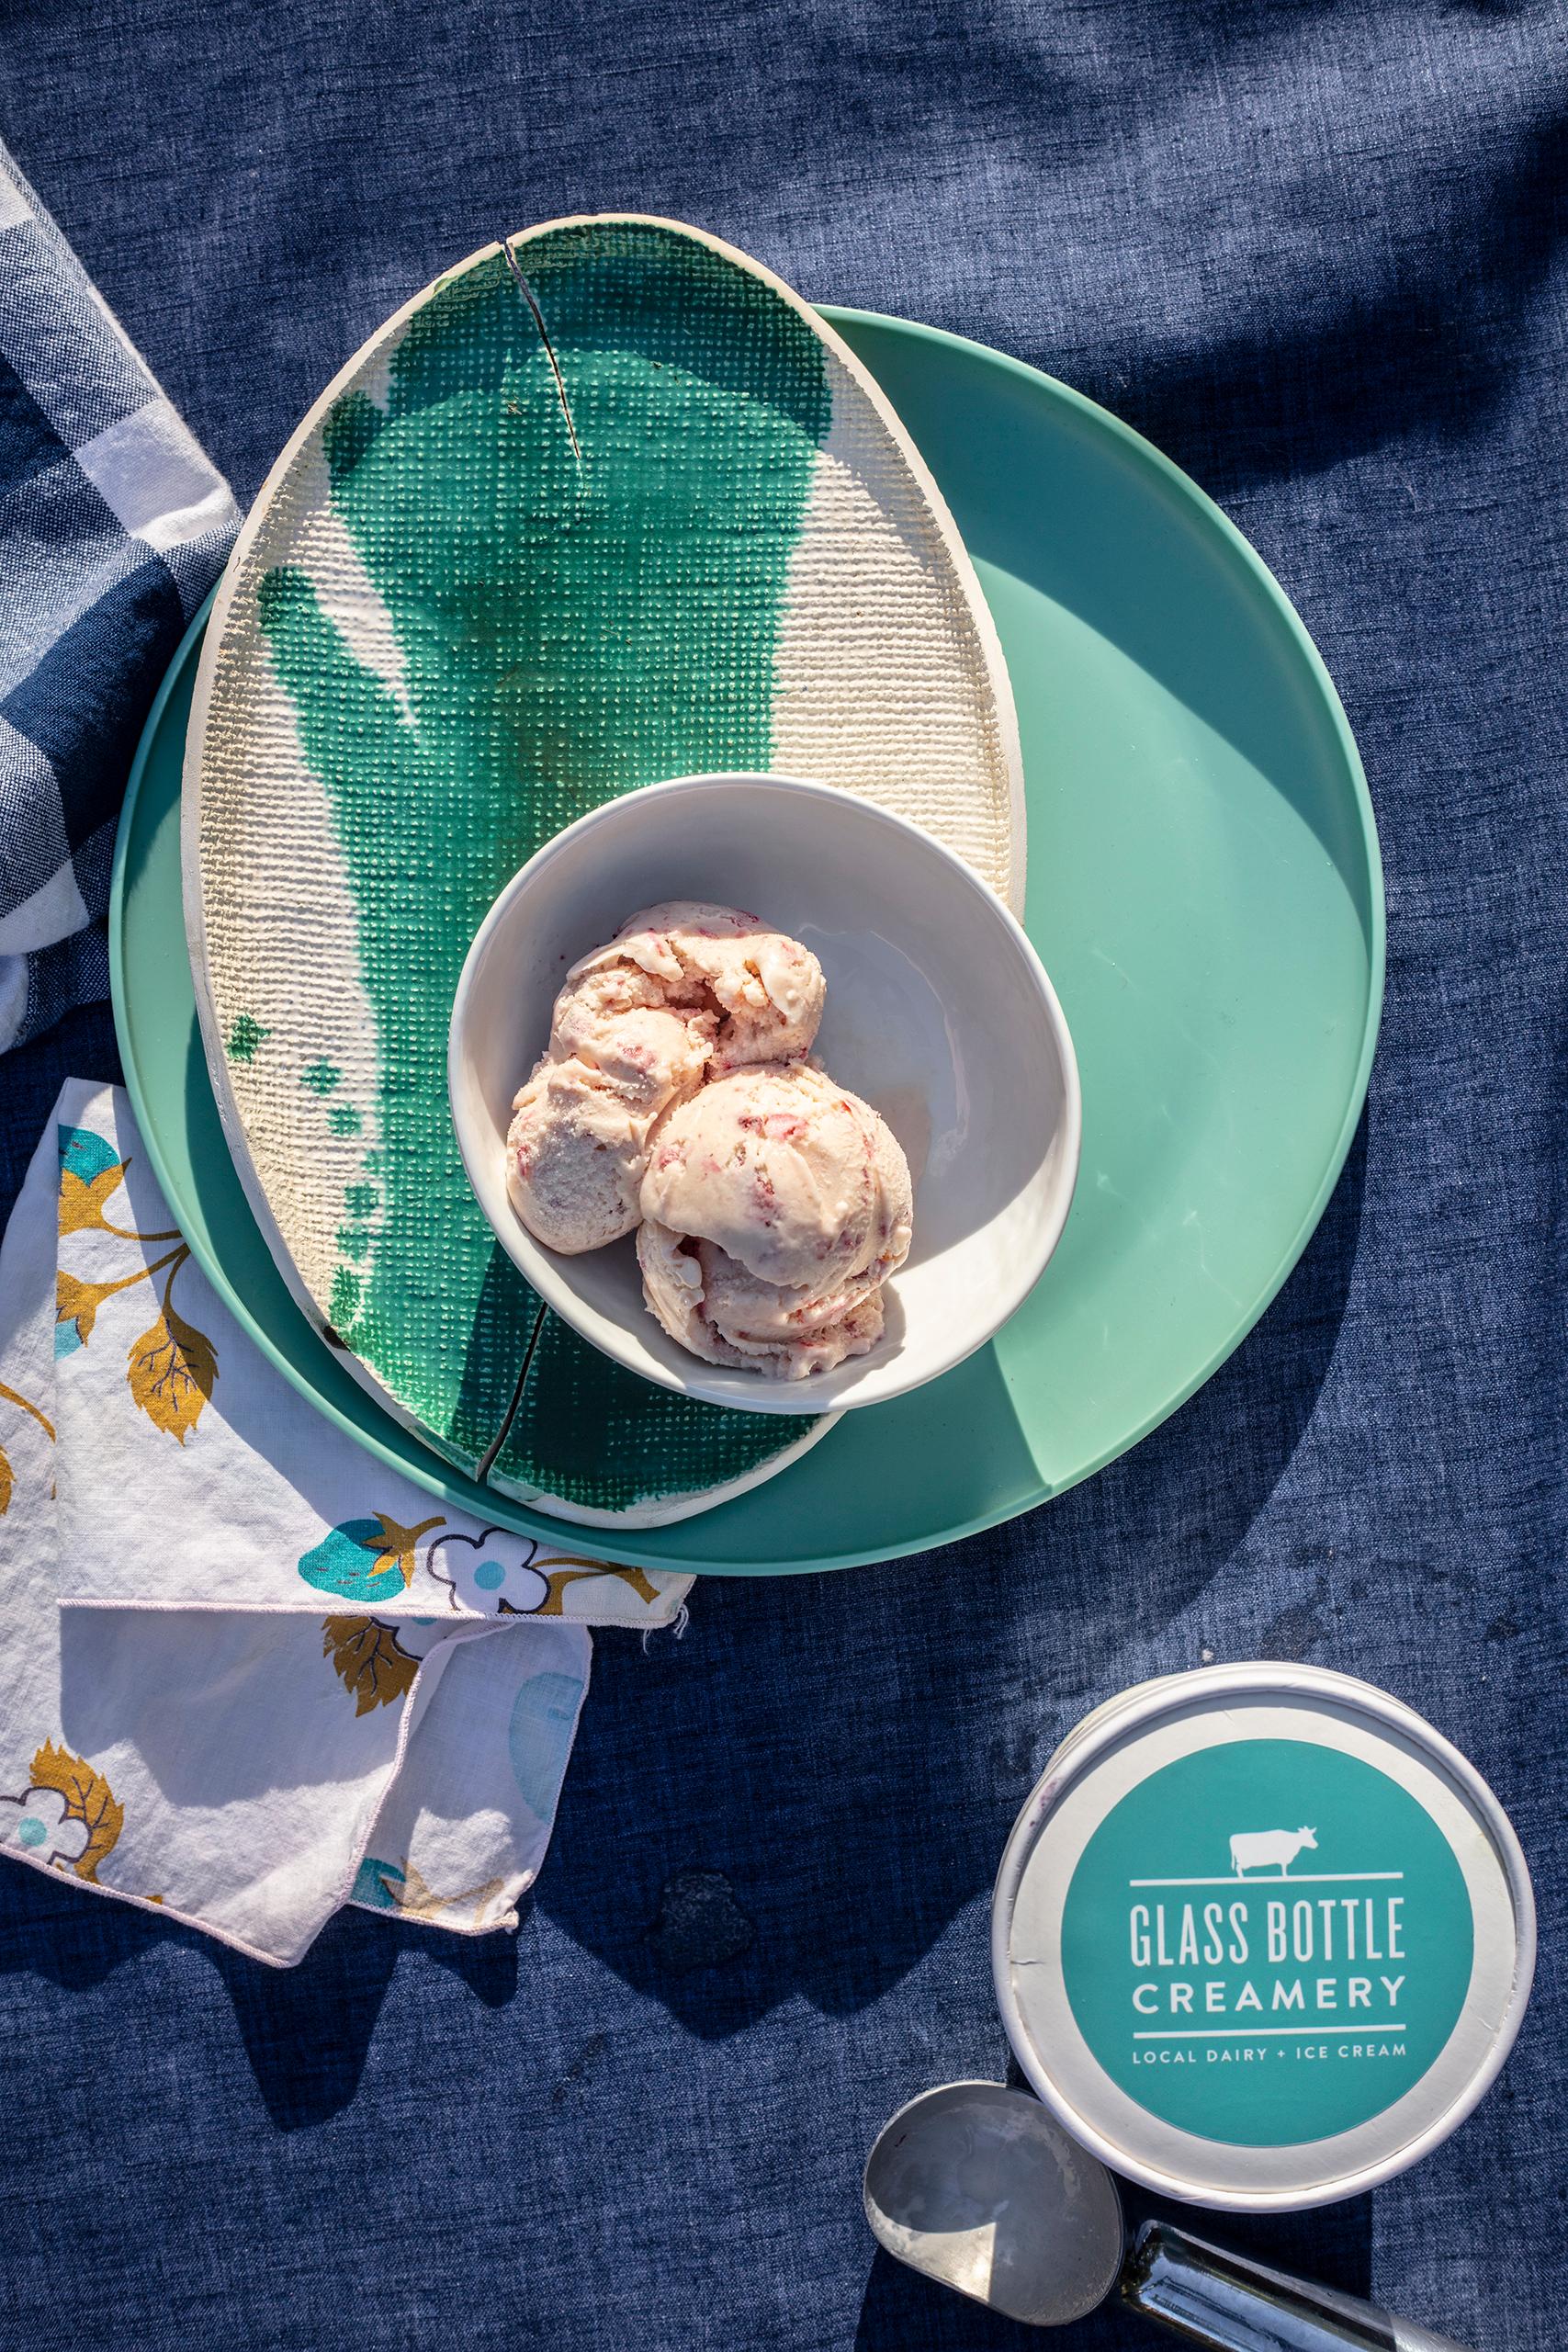 Ice cream and mint dishware